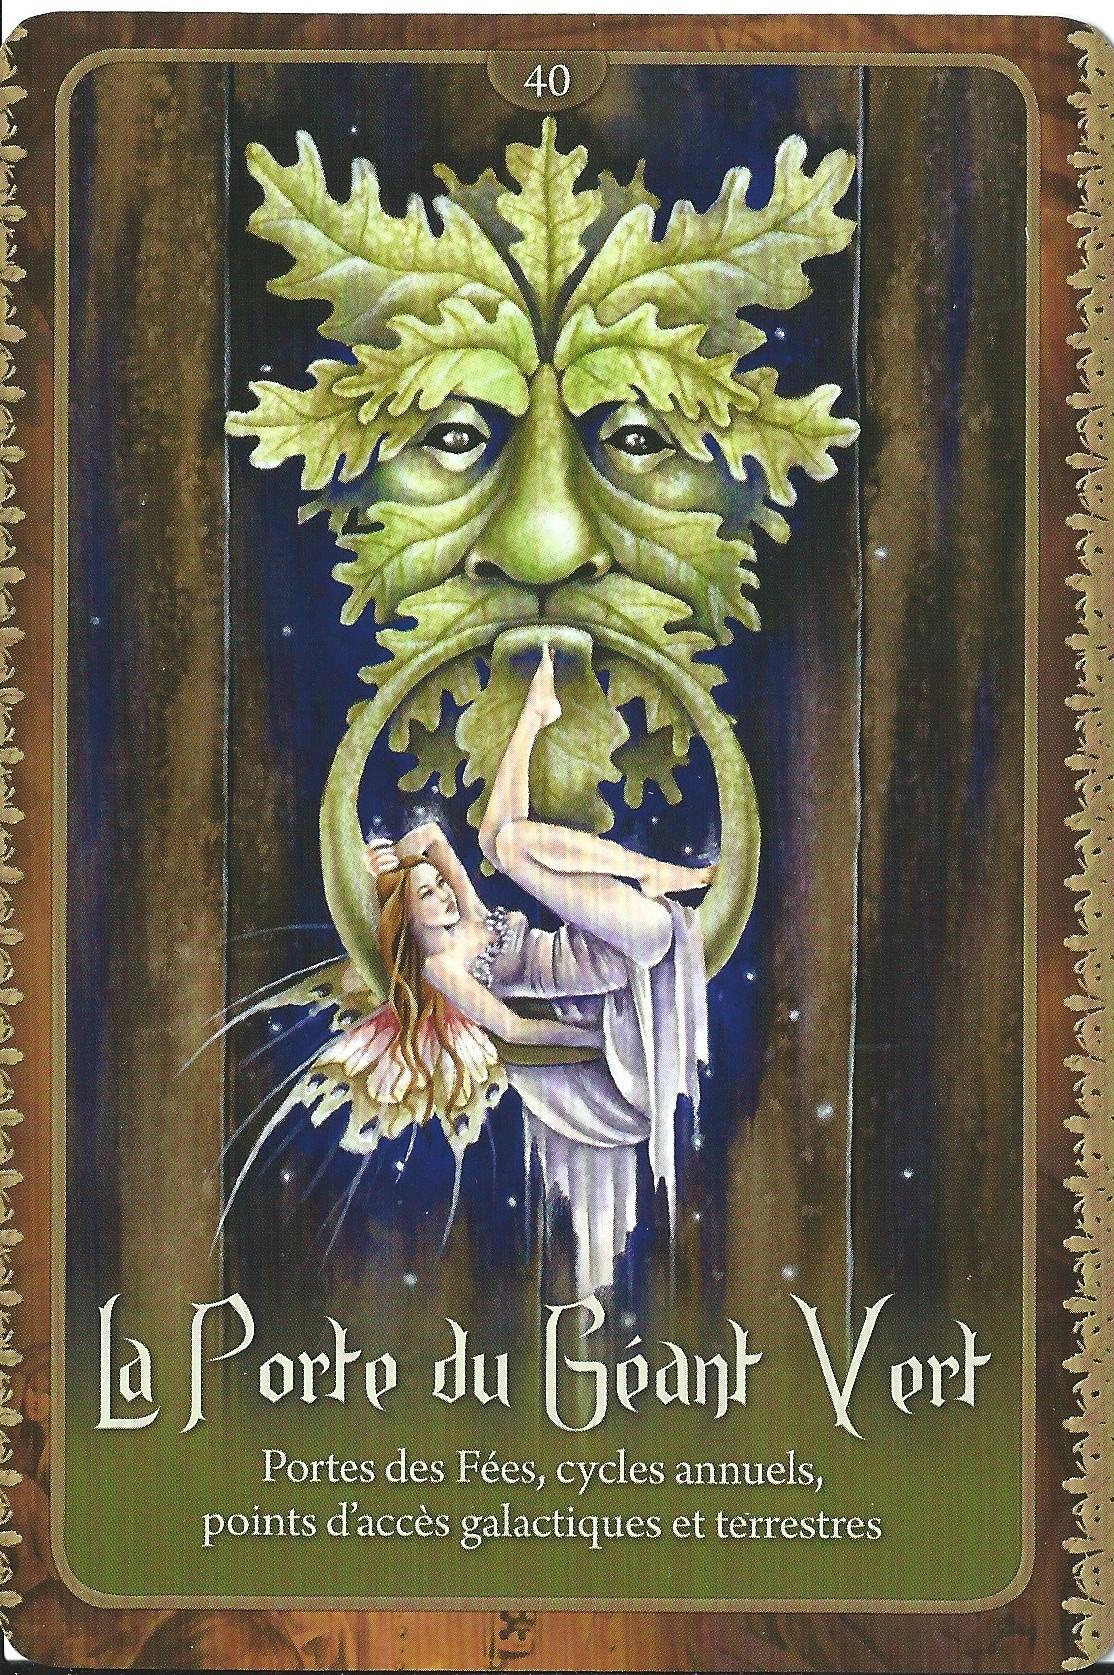 La porte du geant vert